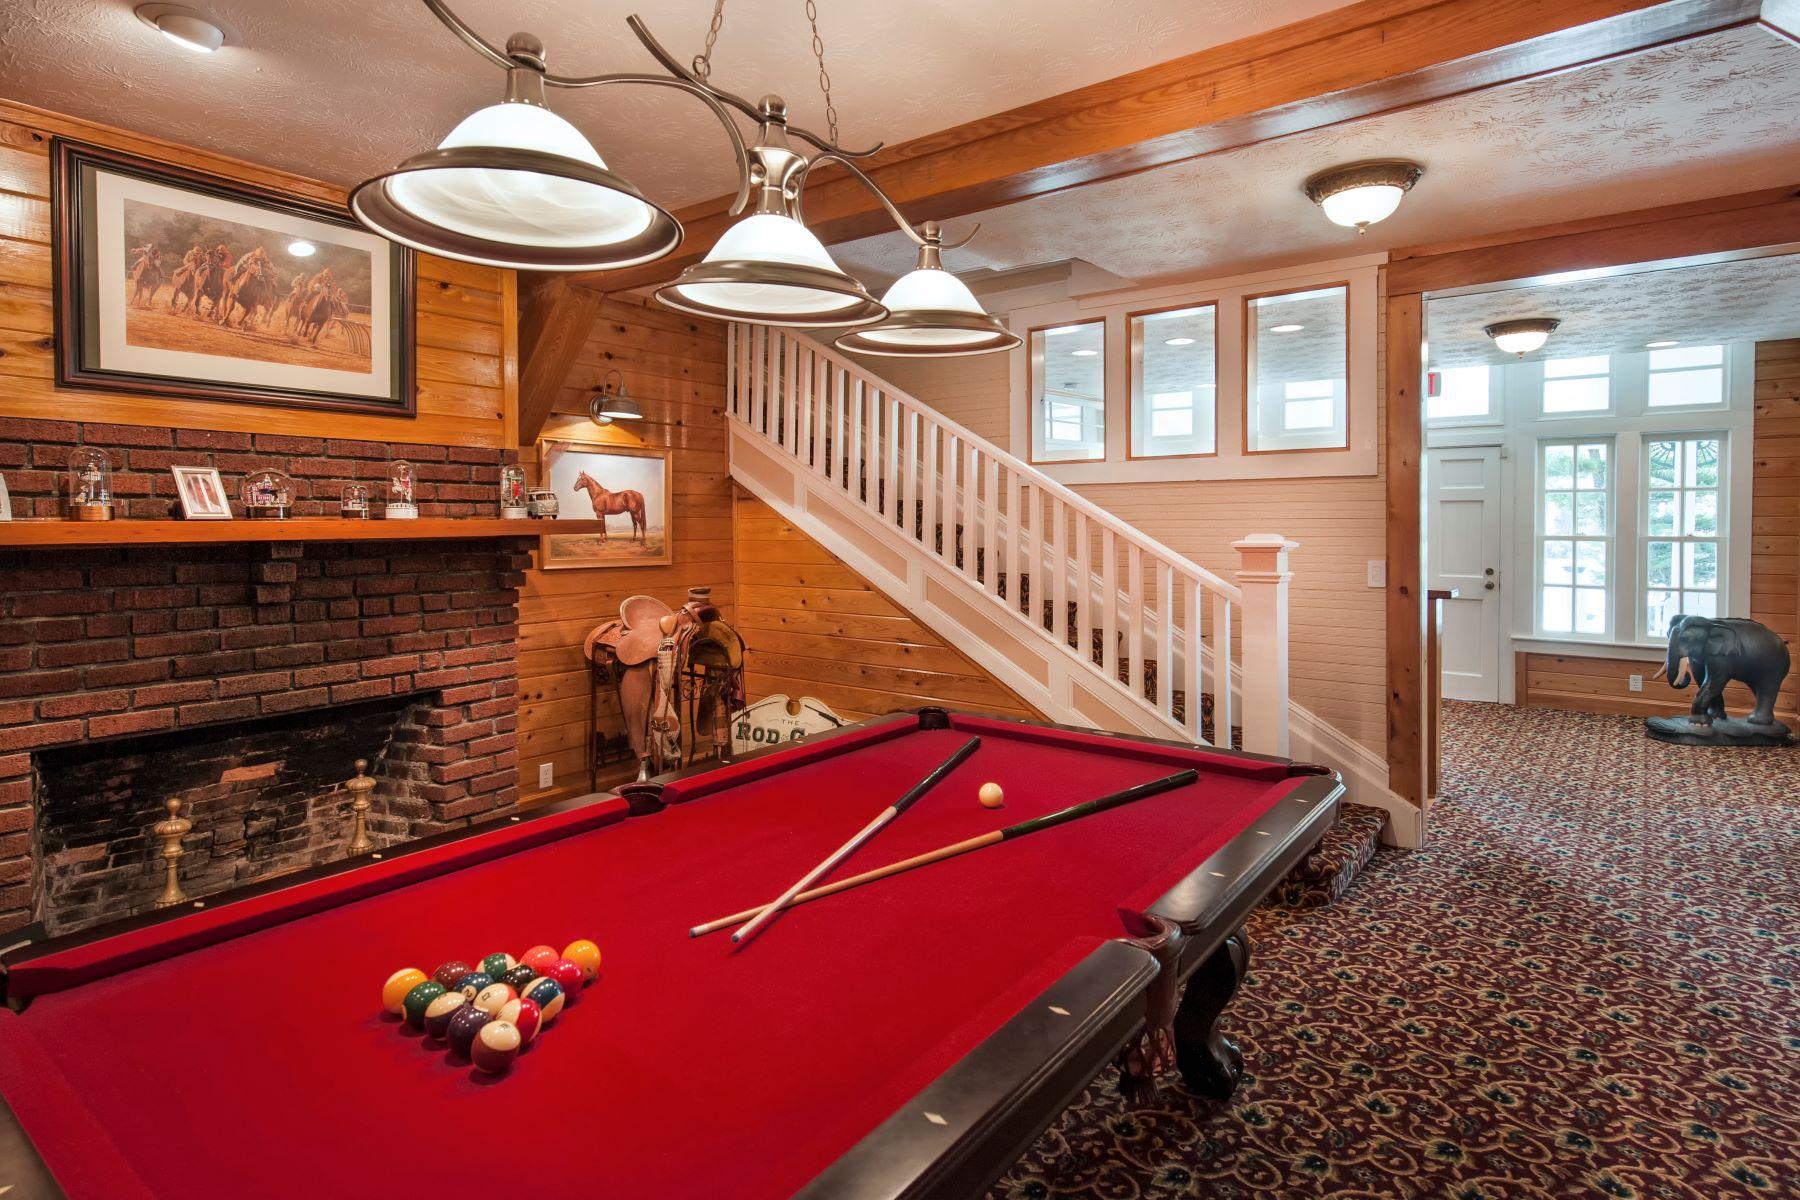 Additional photo for property listing at The Fellsmere Inn 107 N Broadway Street Fellsmere, Floride 32948 États-Unis